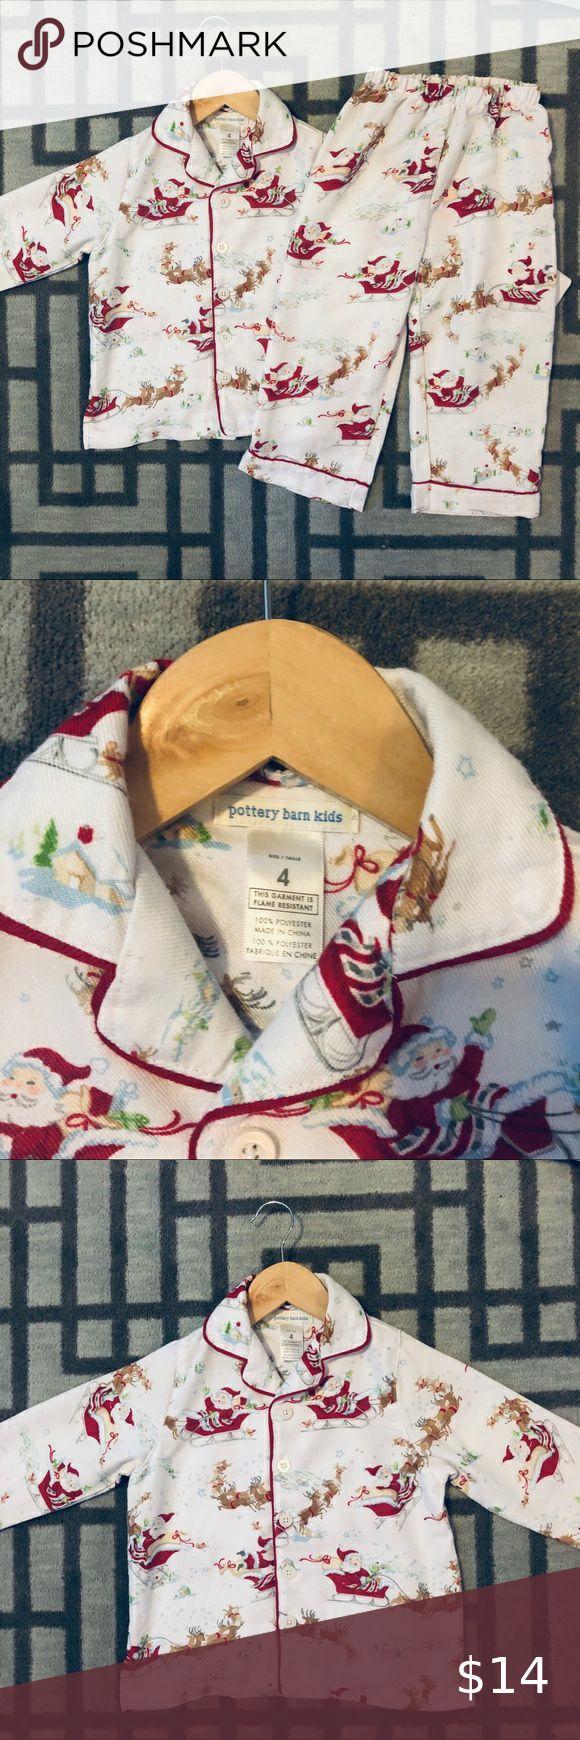 Pottery Barn Christmas Pajamas set size 4🥰 in 2020